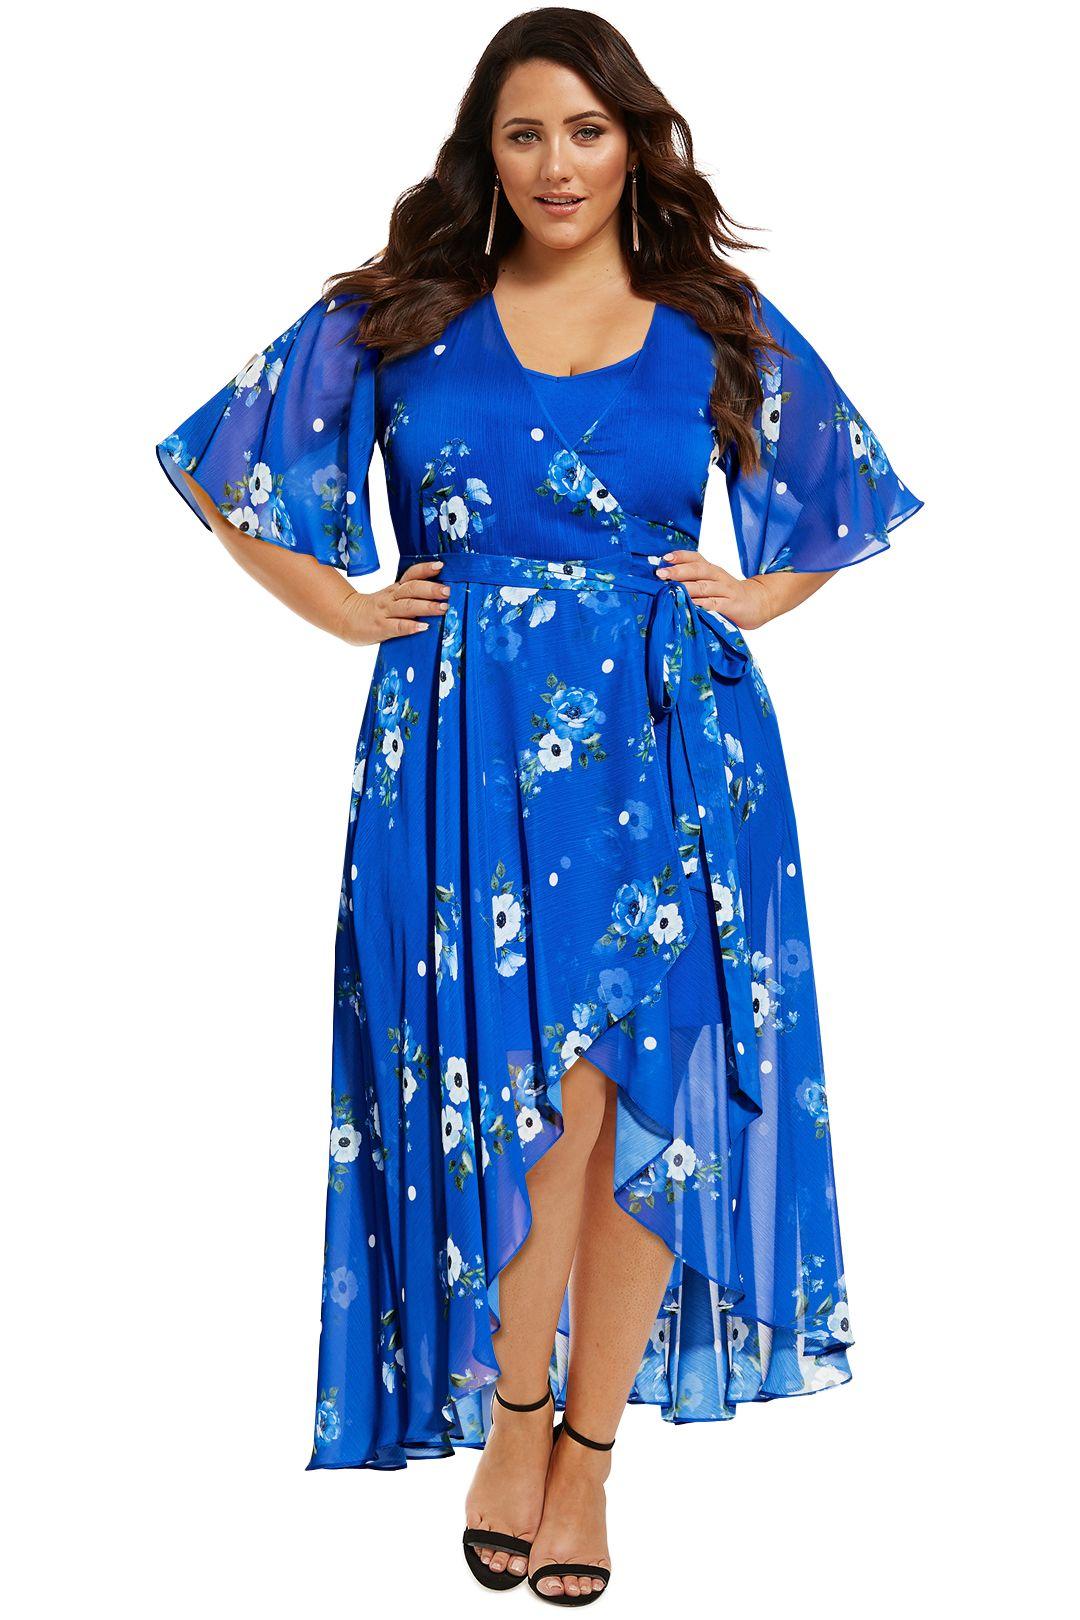 City-Chic-Blue-Floral-Maxi-Dress-Front